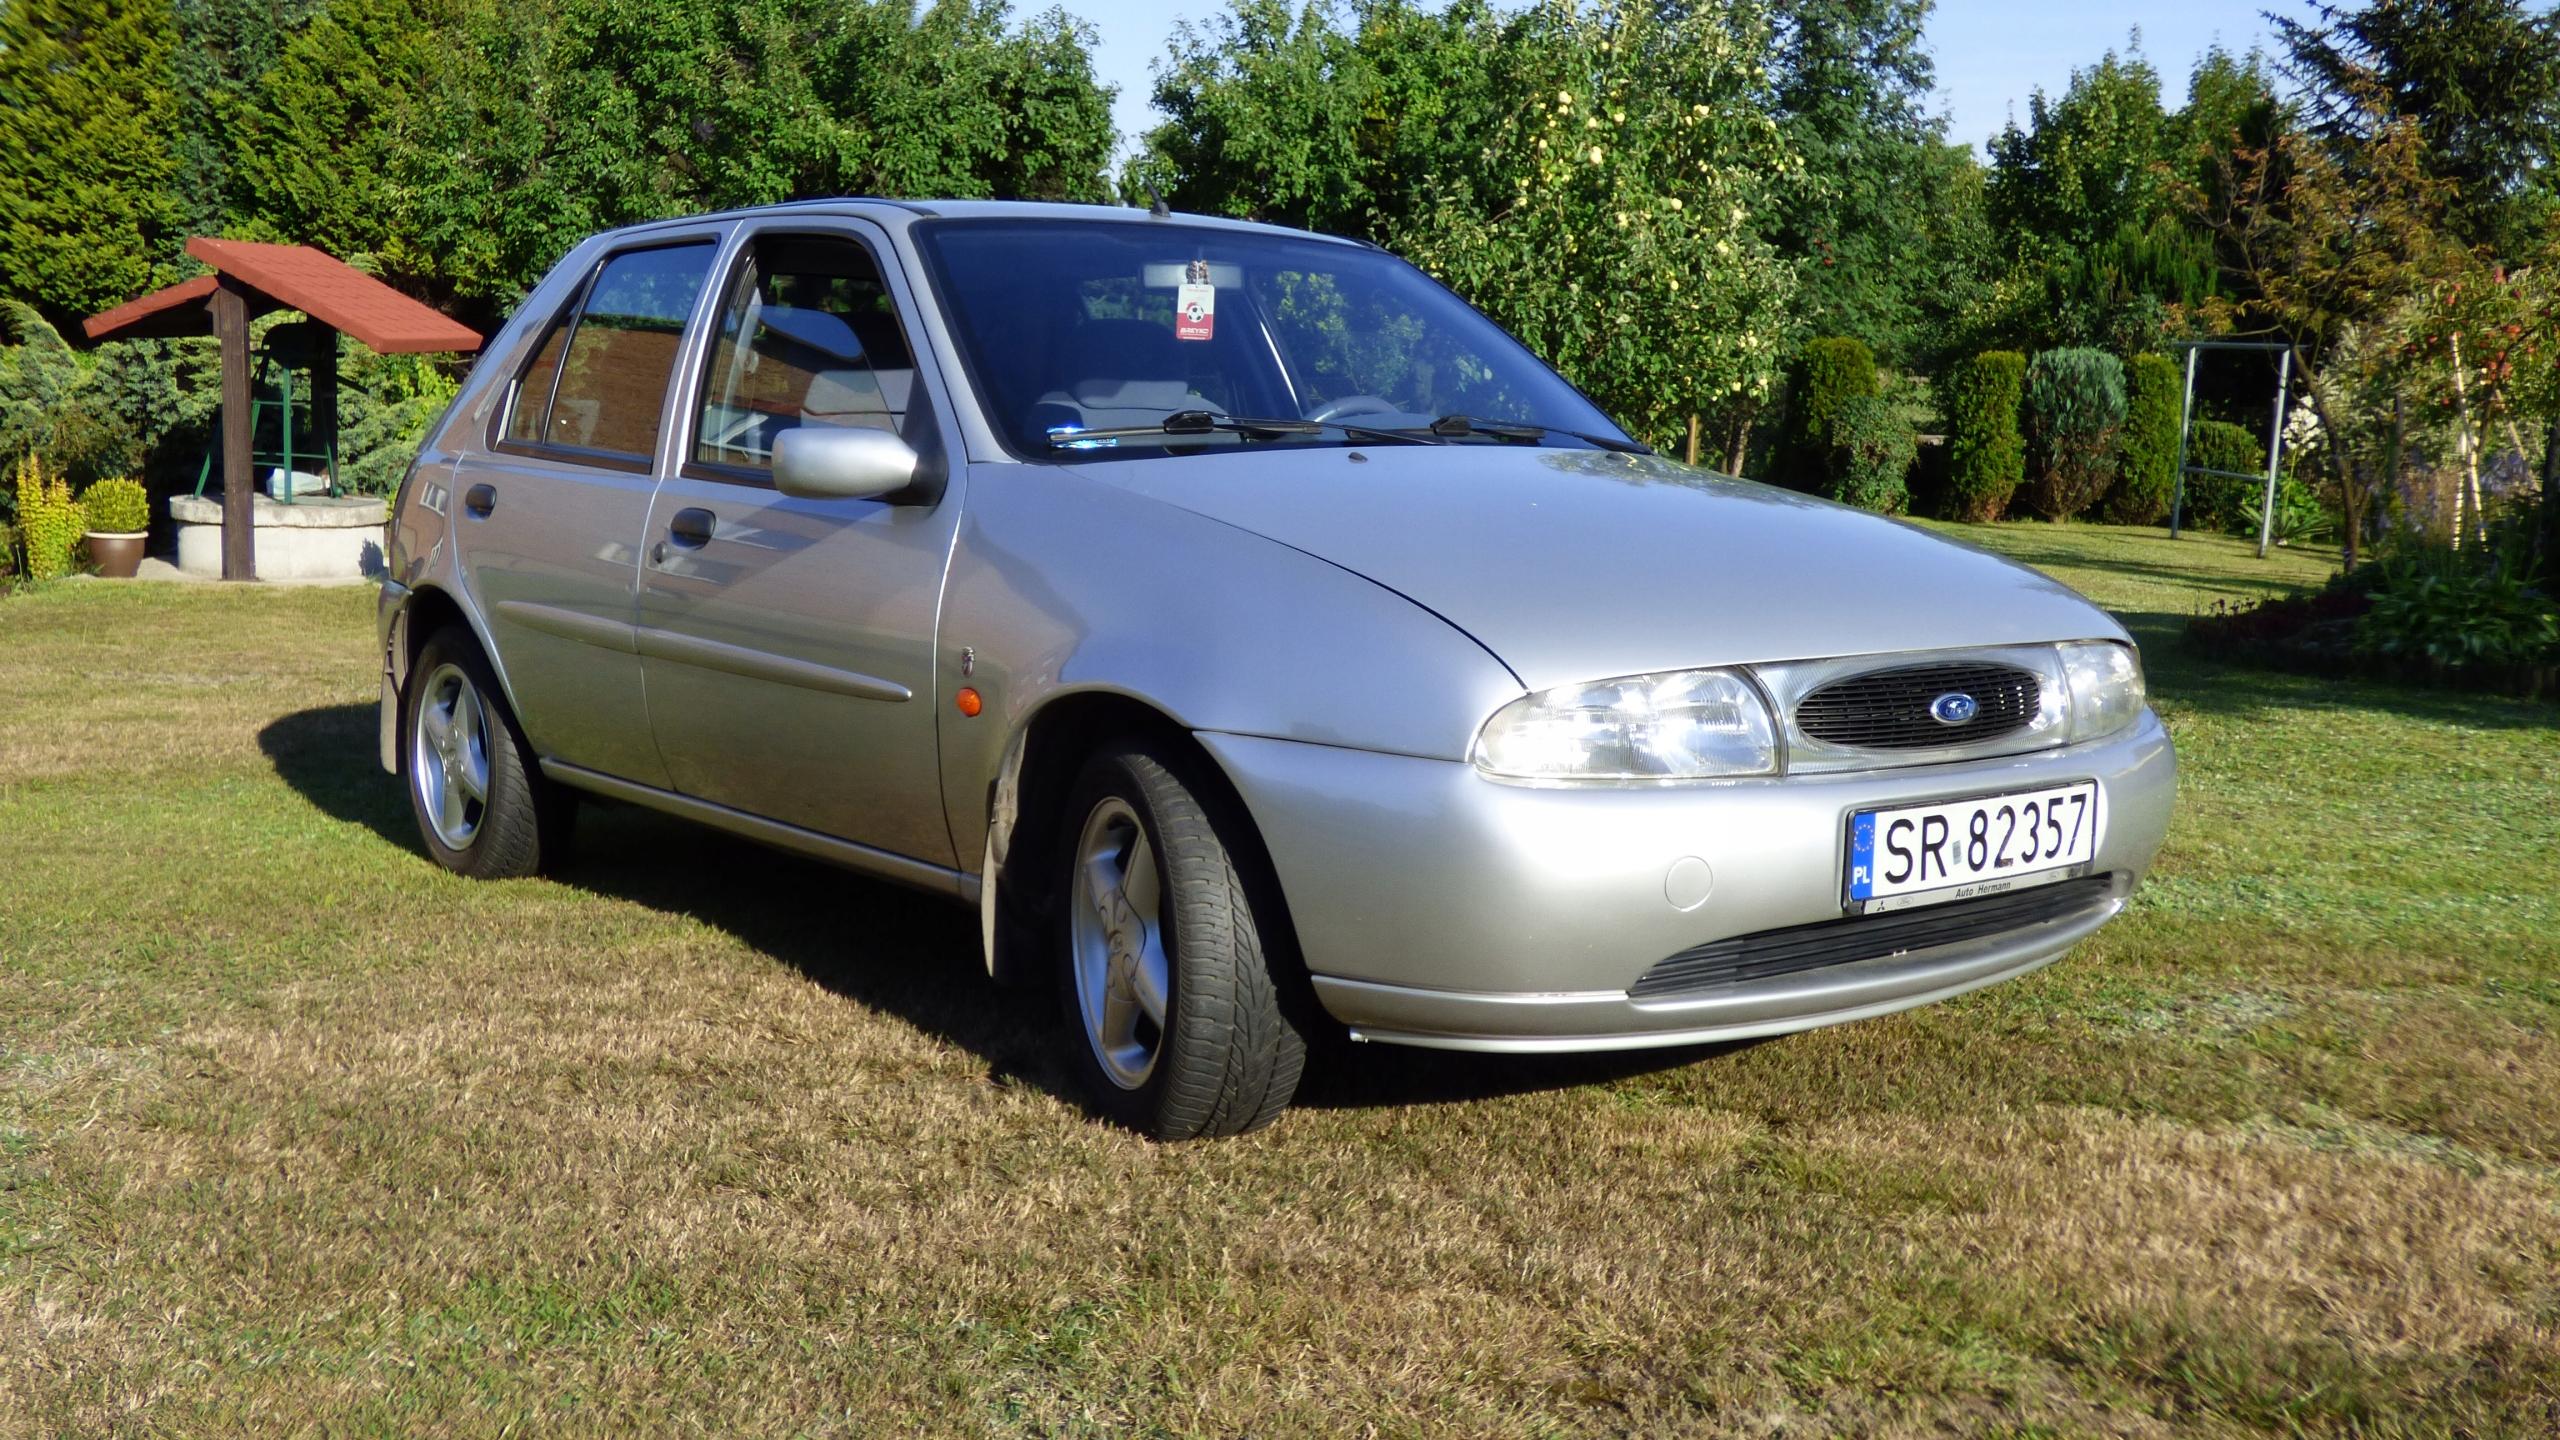 Ford Fiesta 1997, 78000 przebiegu